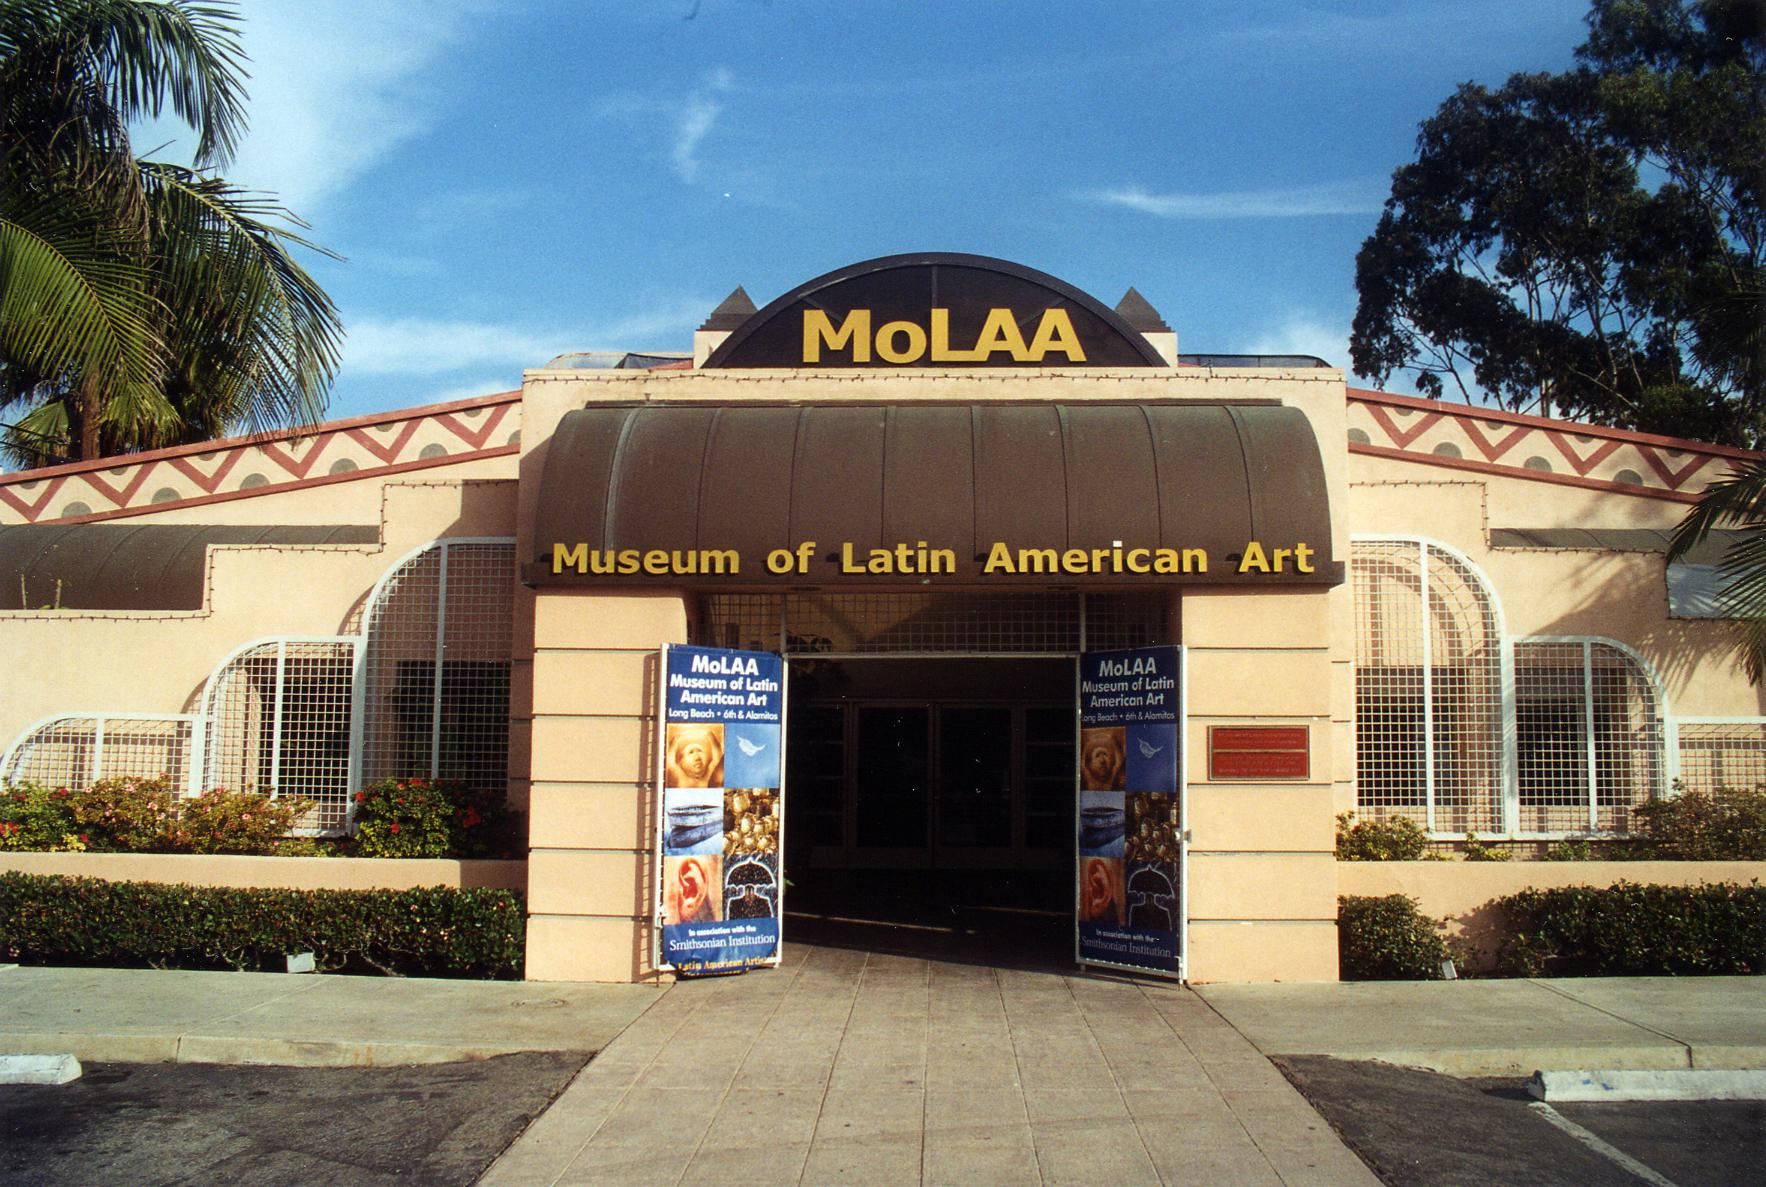 The original MOLAA Building